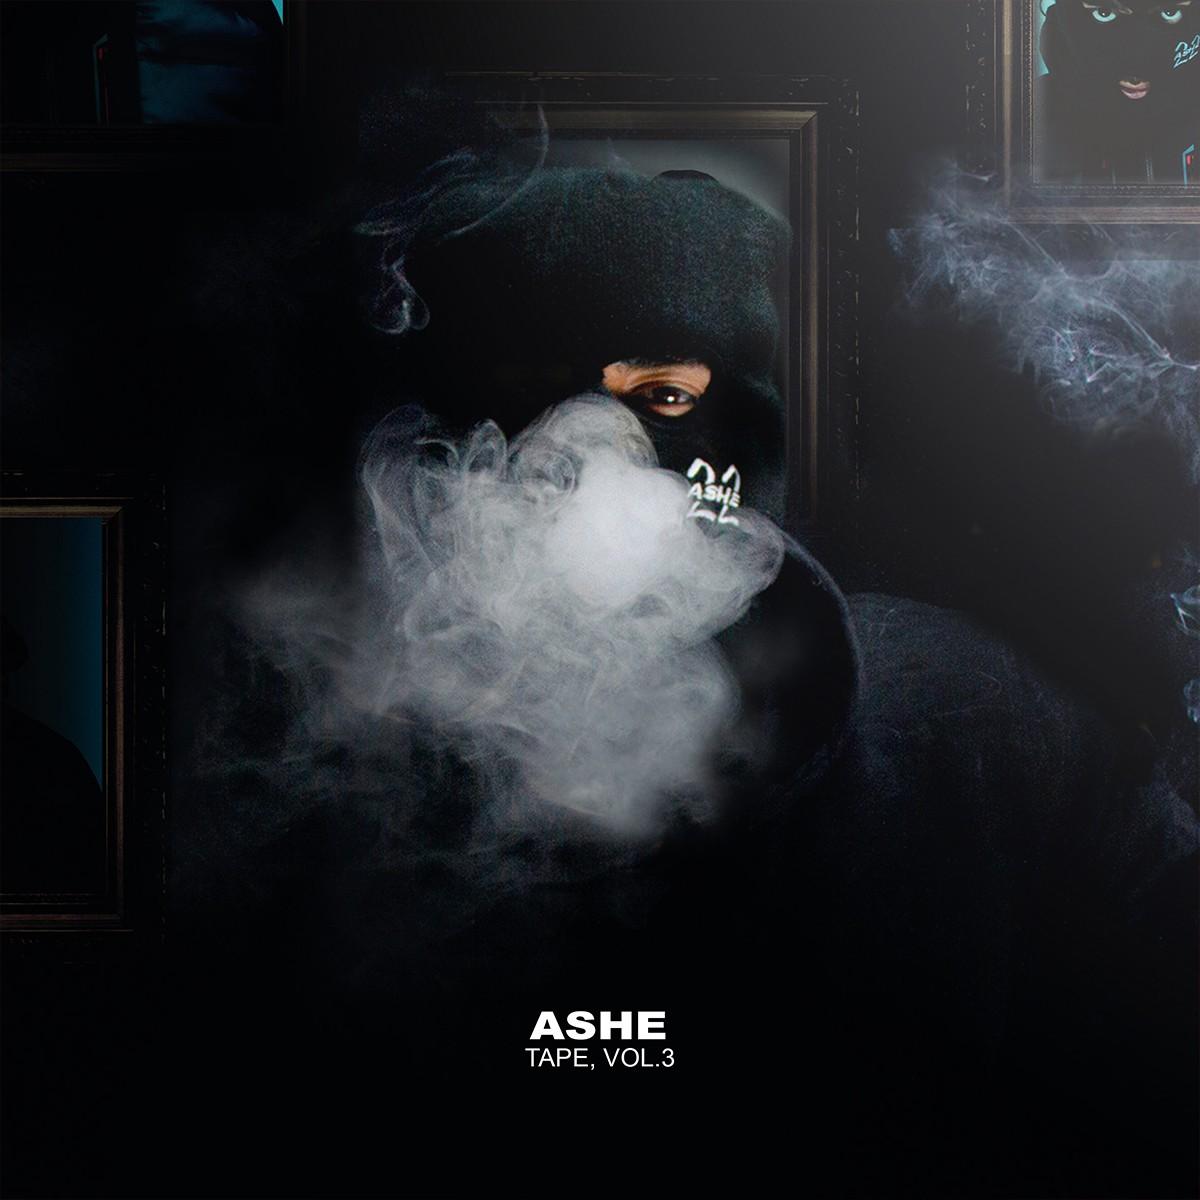 Ashe22 - Ashe Tape vol.3